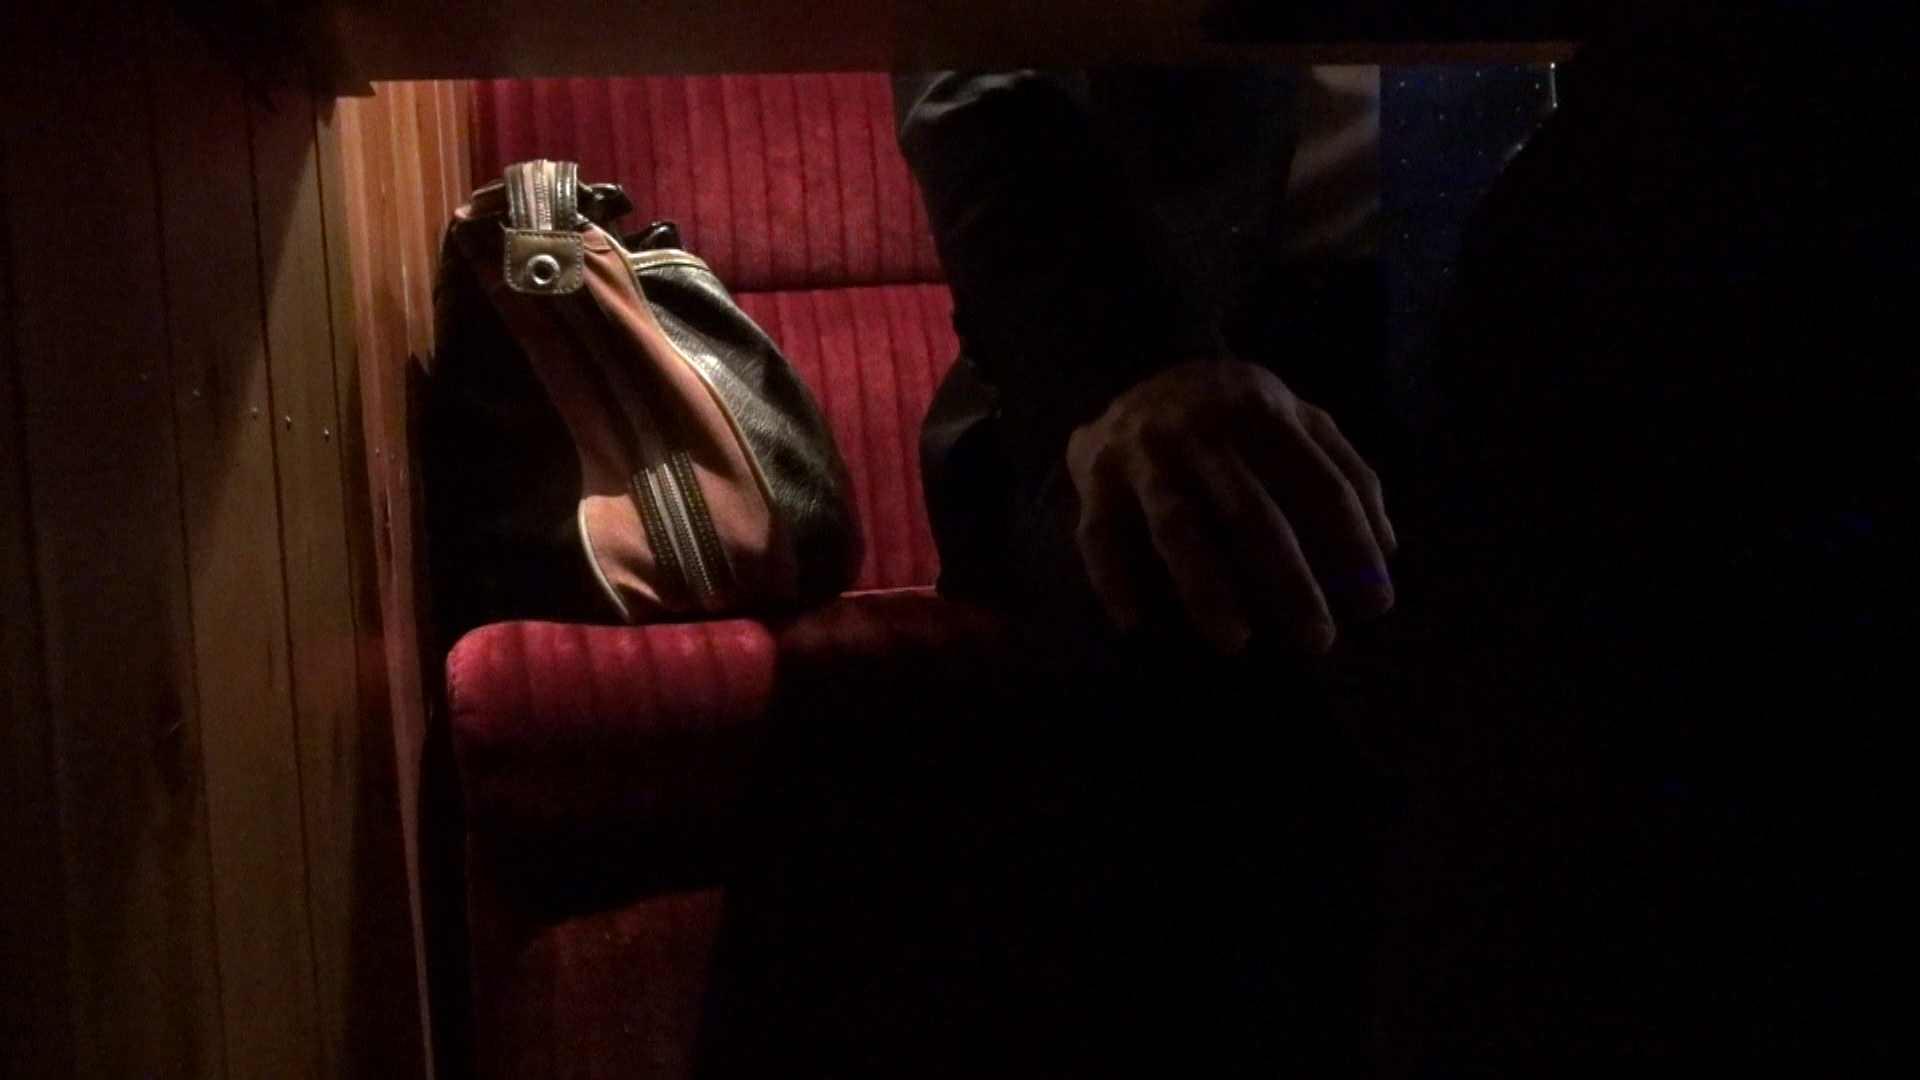 episode1 ヒロトさんと保険外交員との顔合わせ おまんこ無修正 オメコ動画キャプチャ 71pic 4